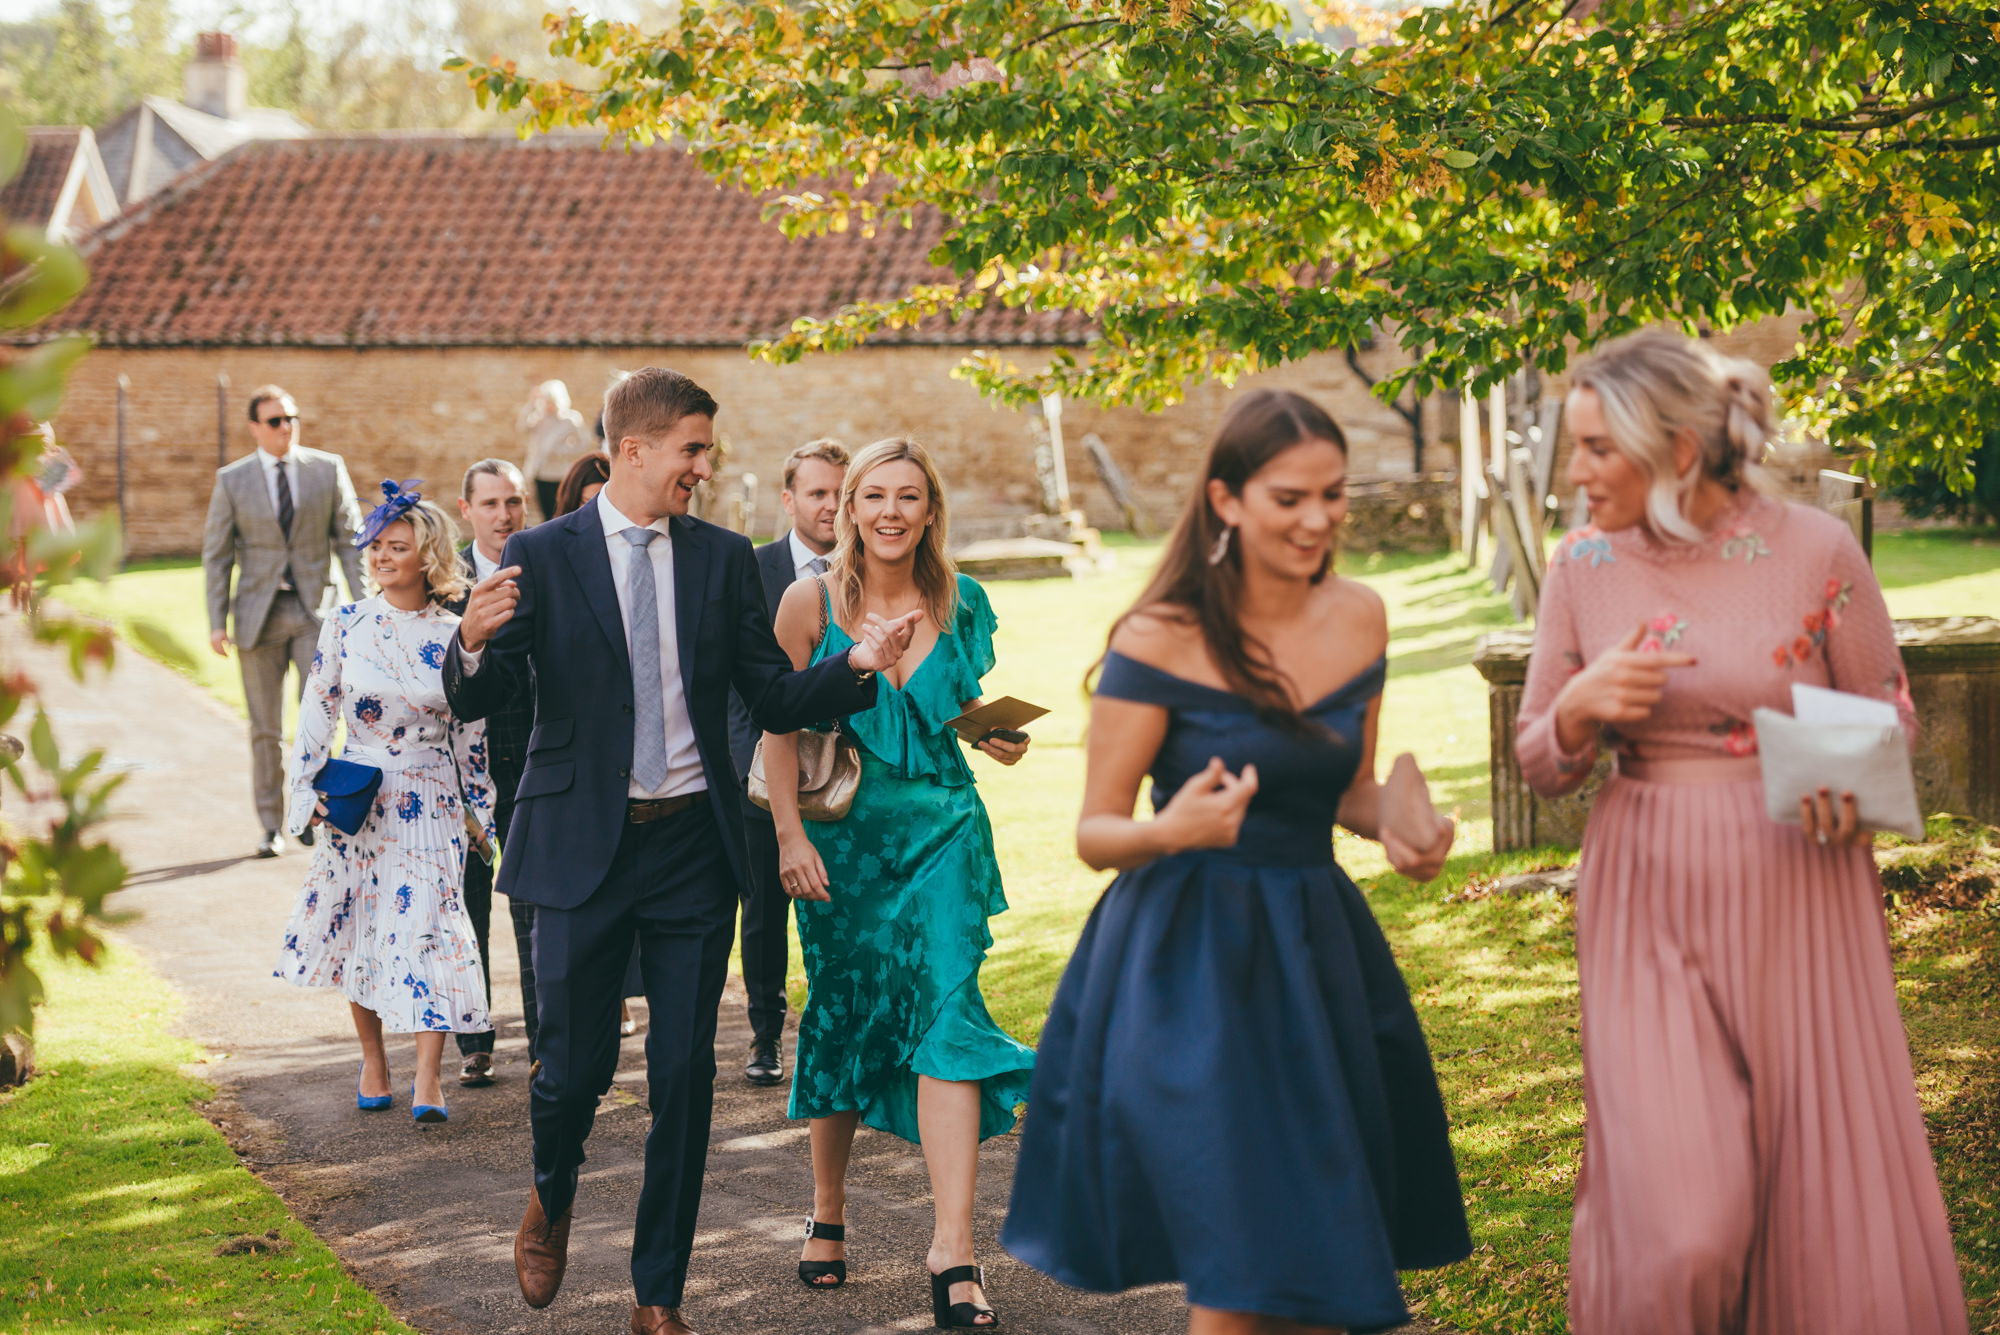 wedding guests walking into church